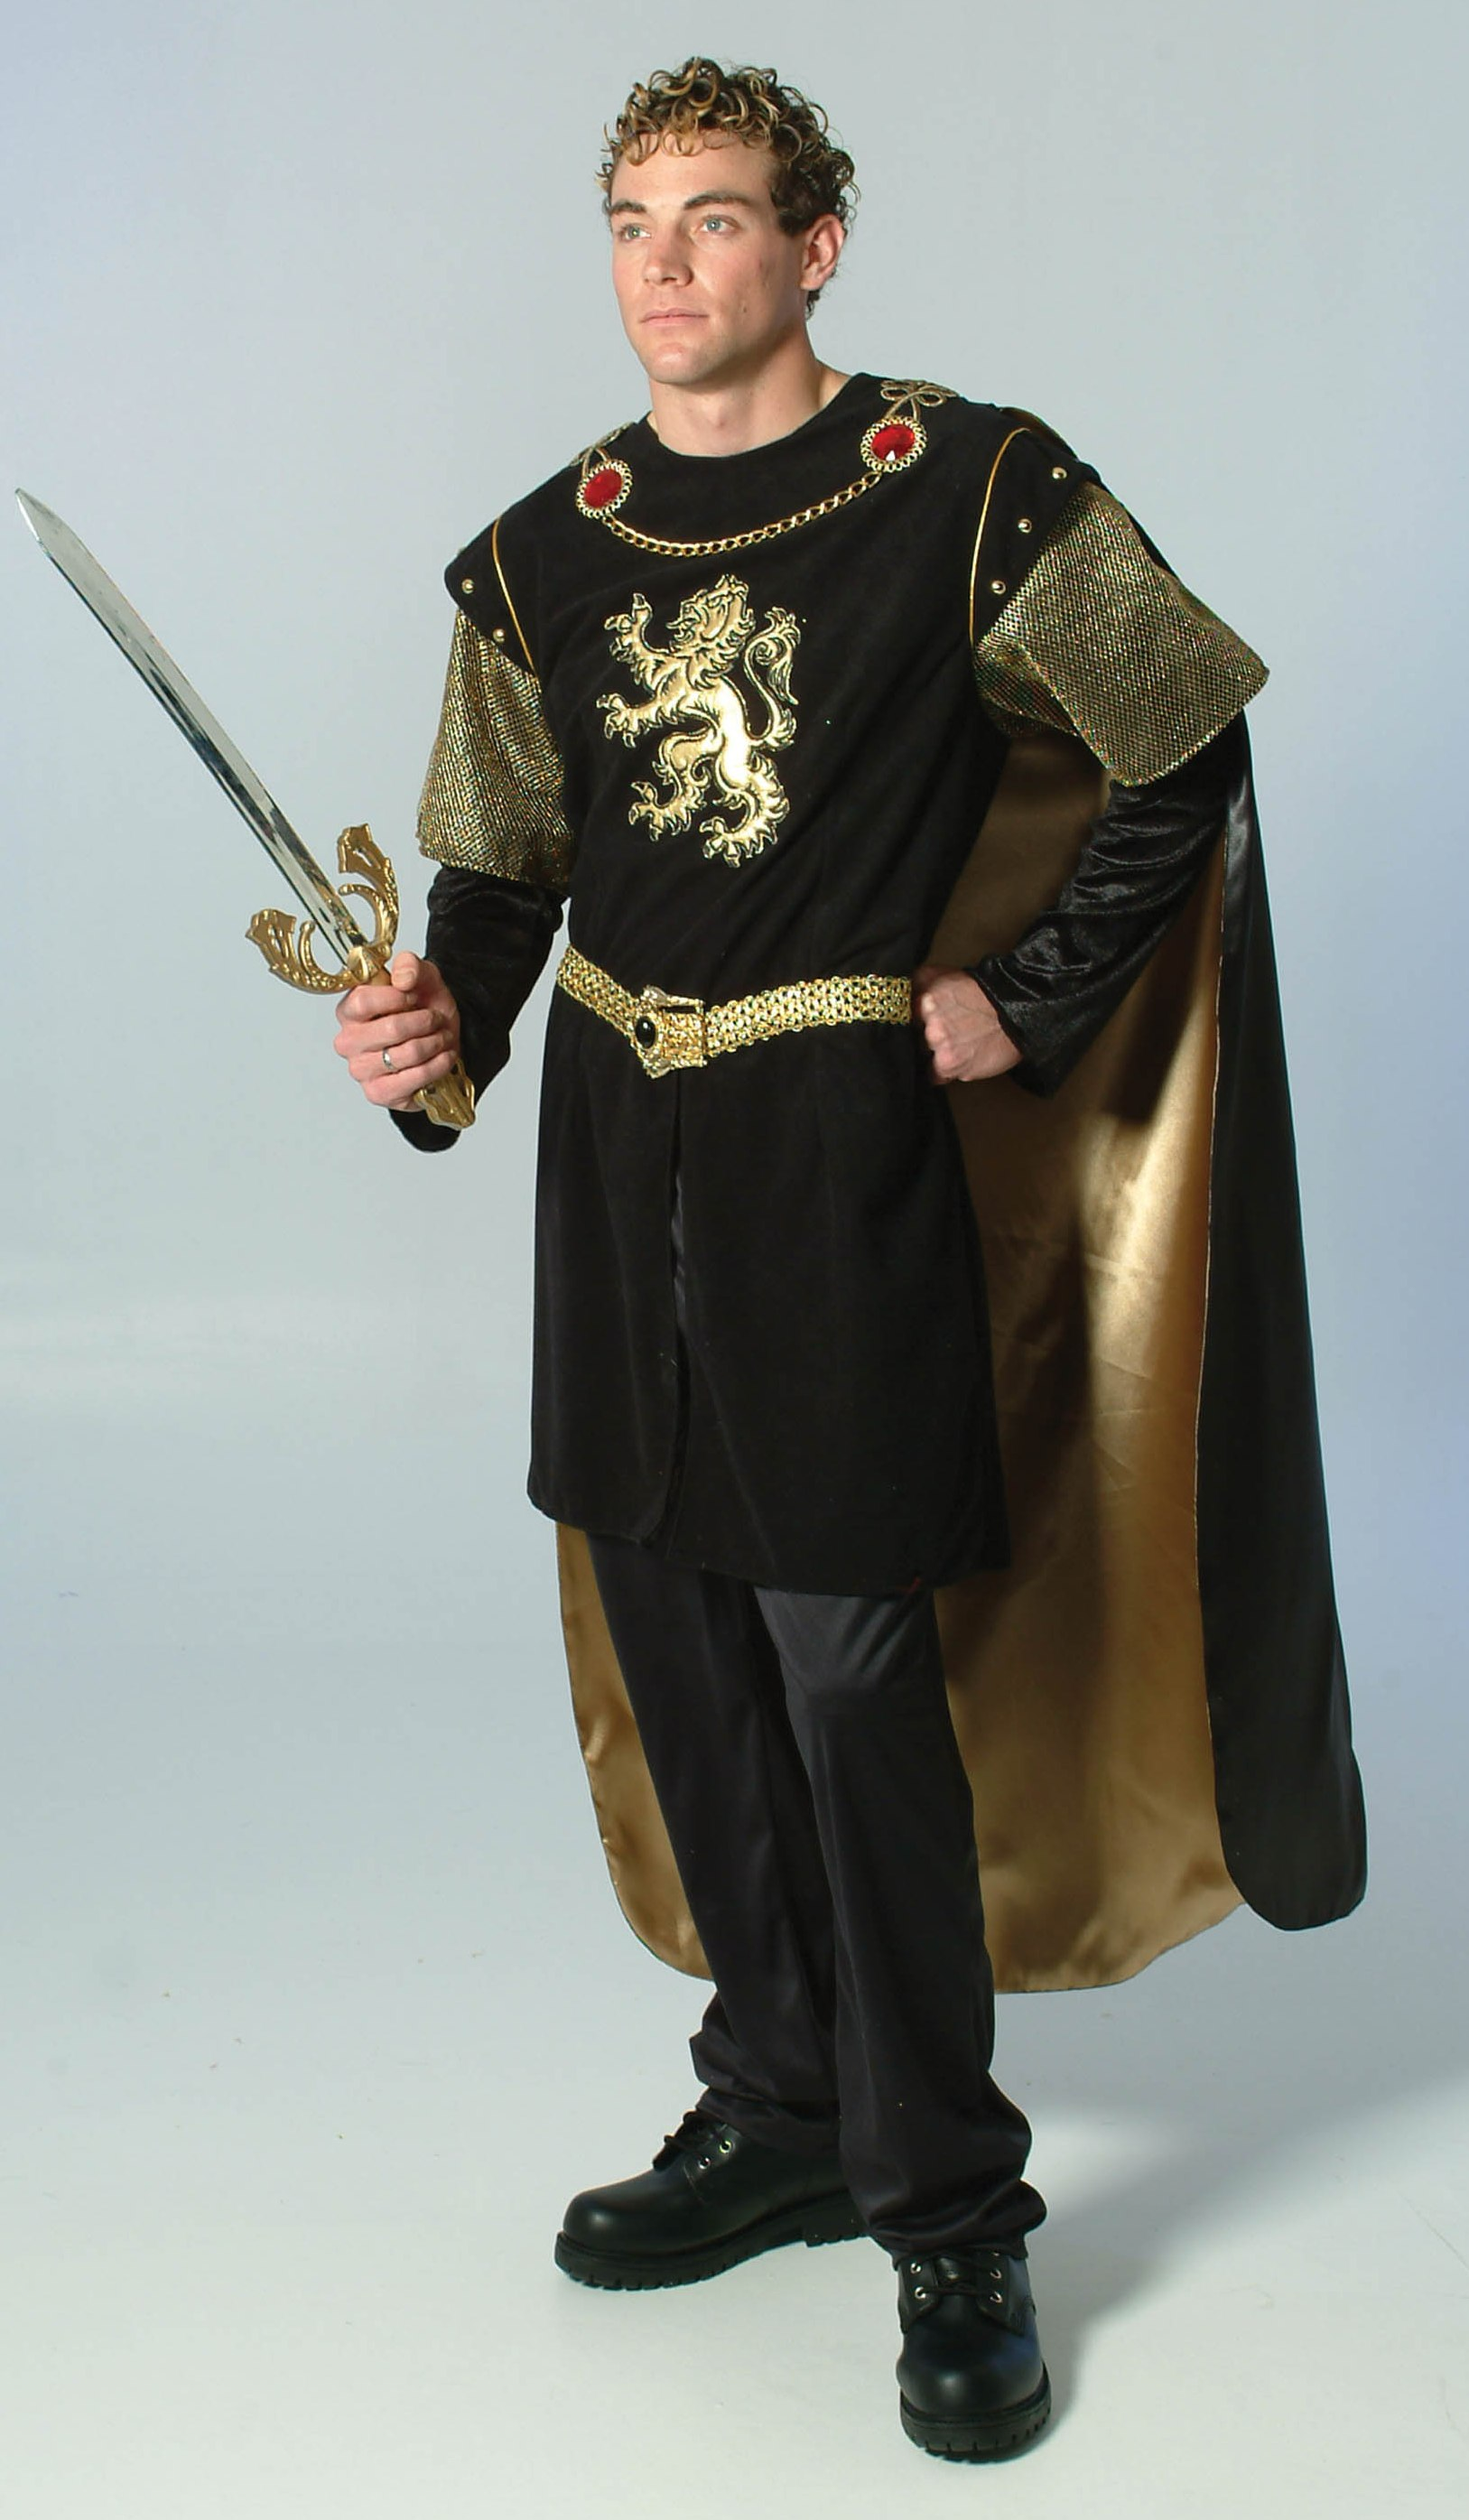 43daa077d27 Medieval Men Costume,Renaissance Costumes,Knight,Monk,Renaissance ...